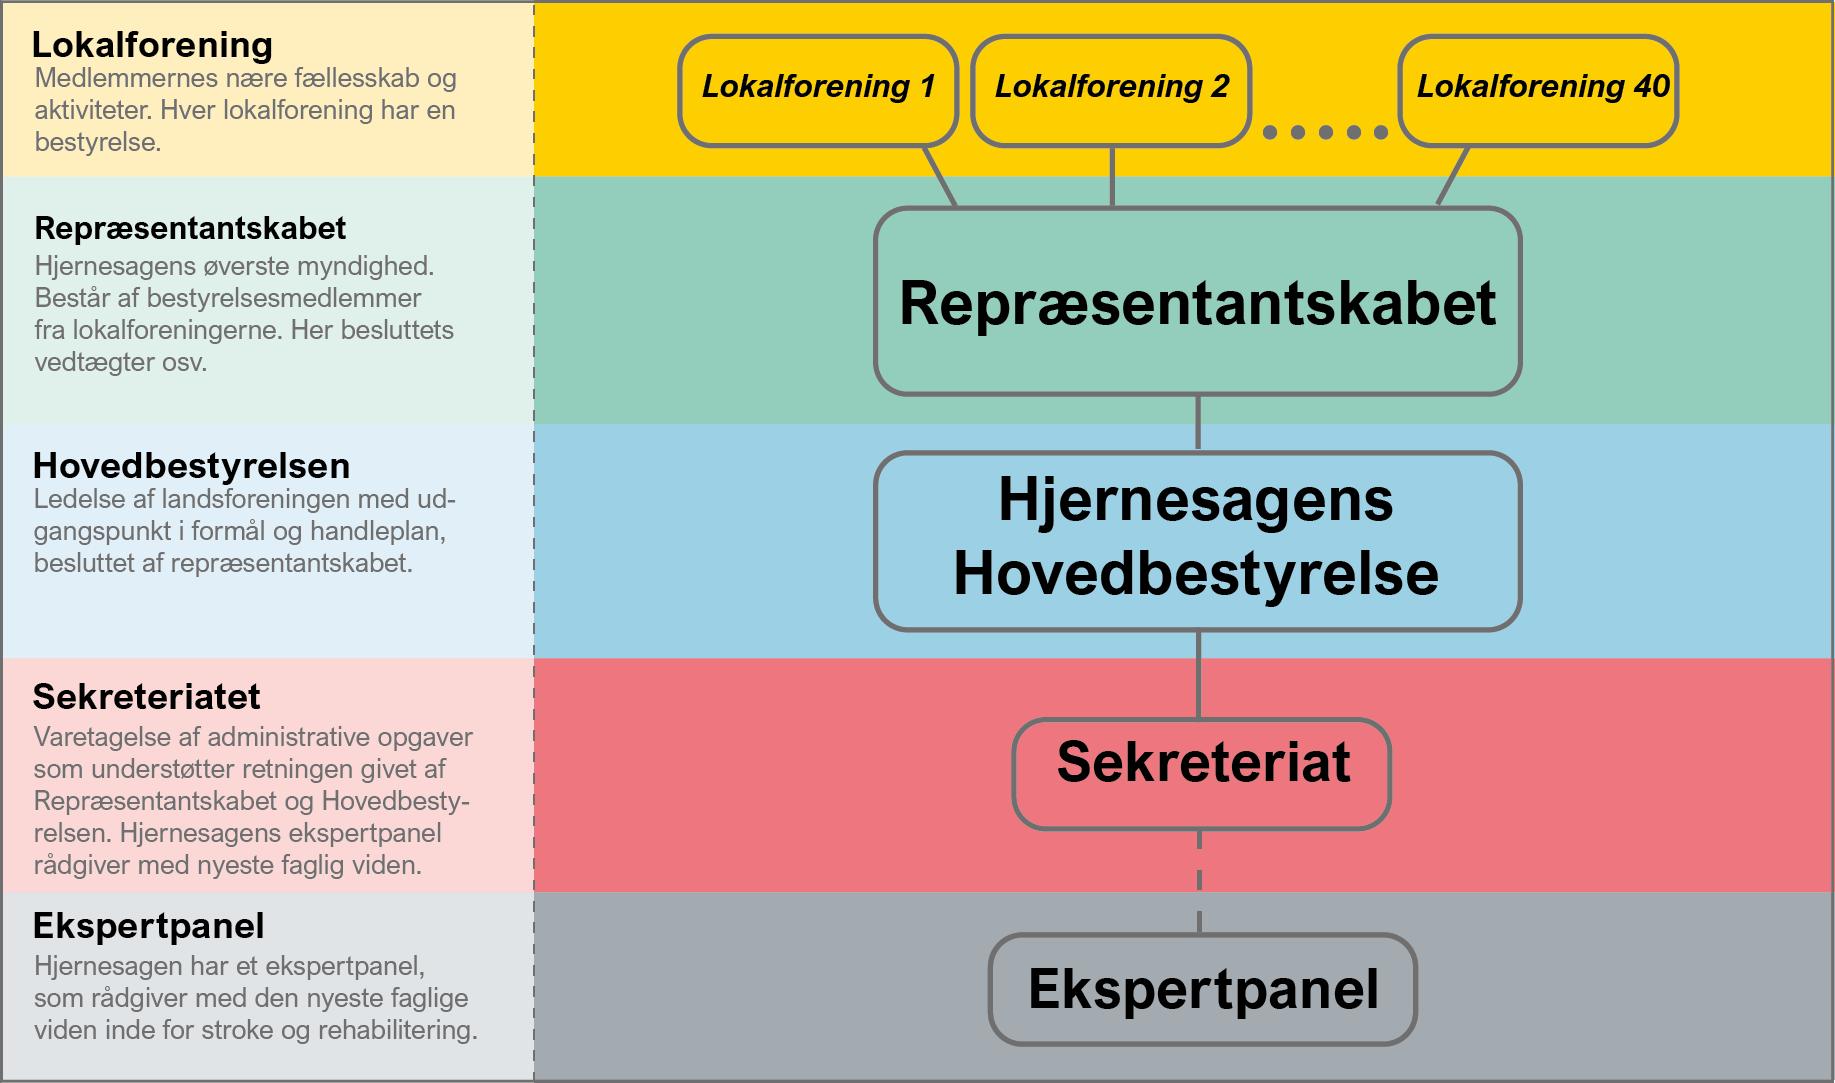 Hjernesagens organisationsdiagram